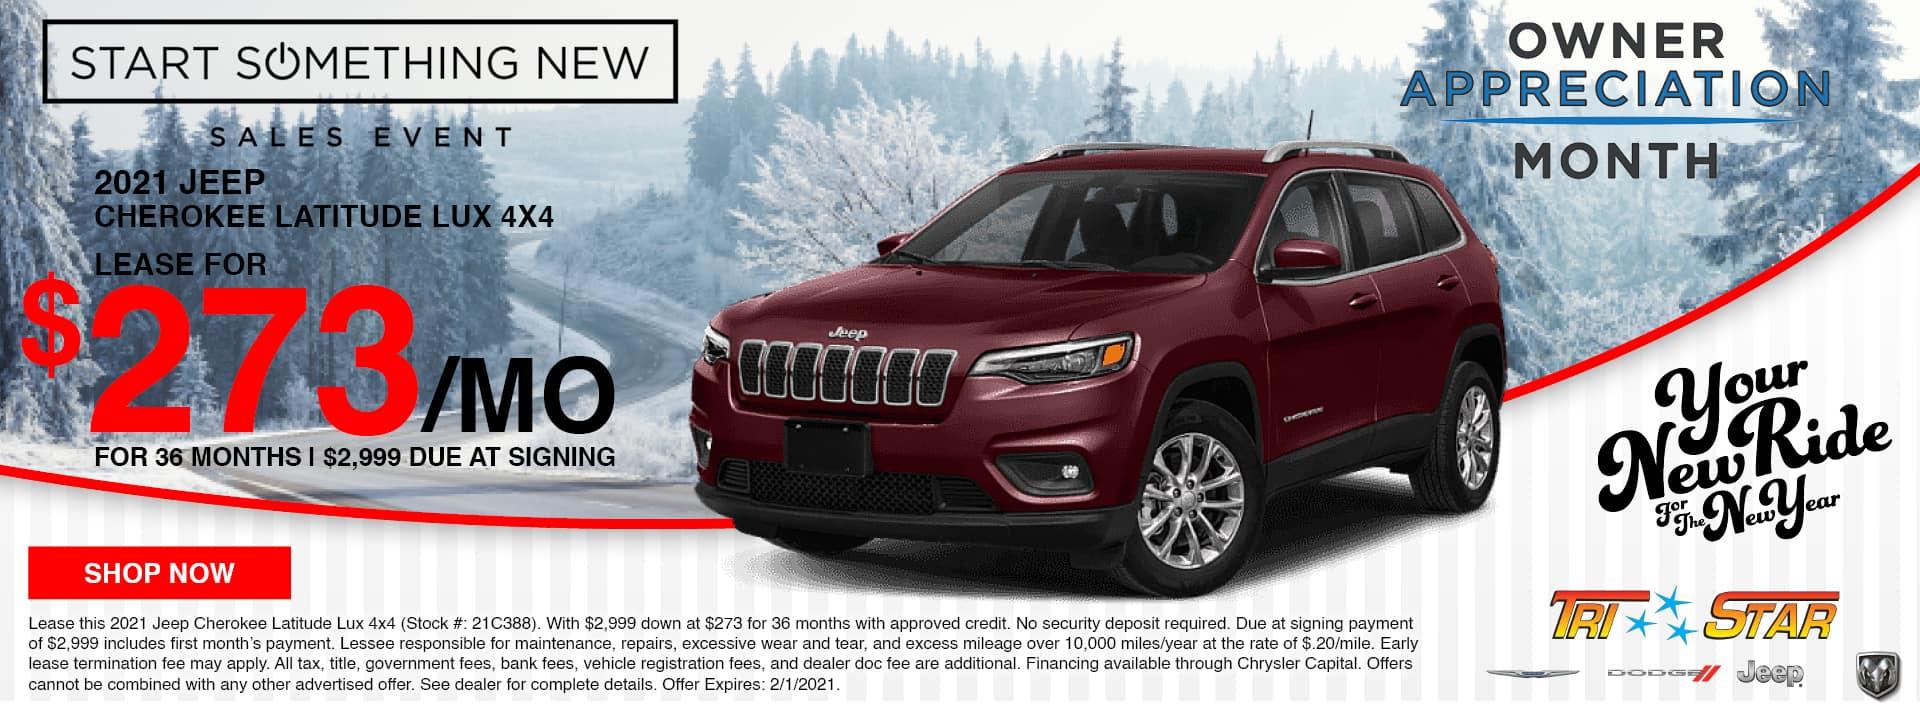 Lease a 2021 Jeep Cherokee Latitude for $273/mo